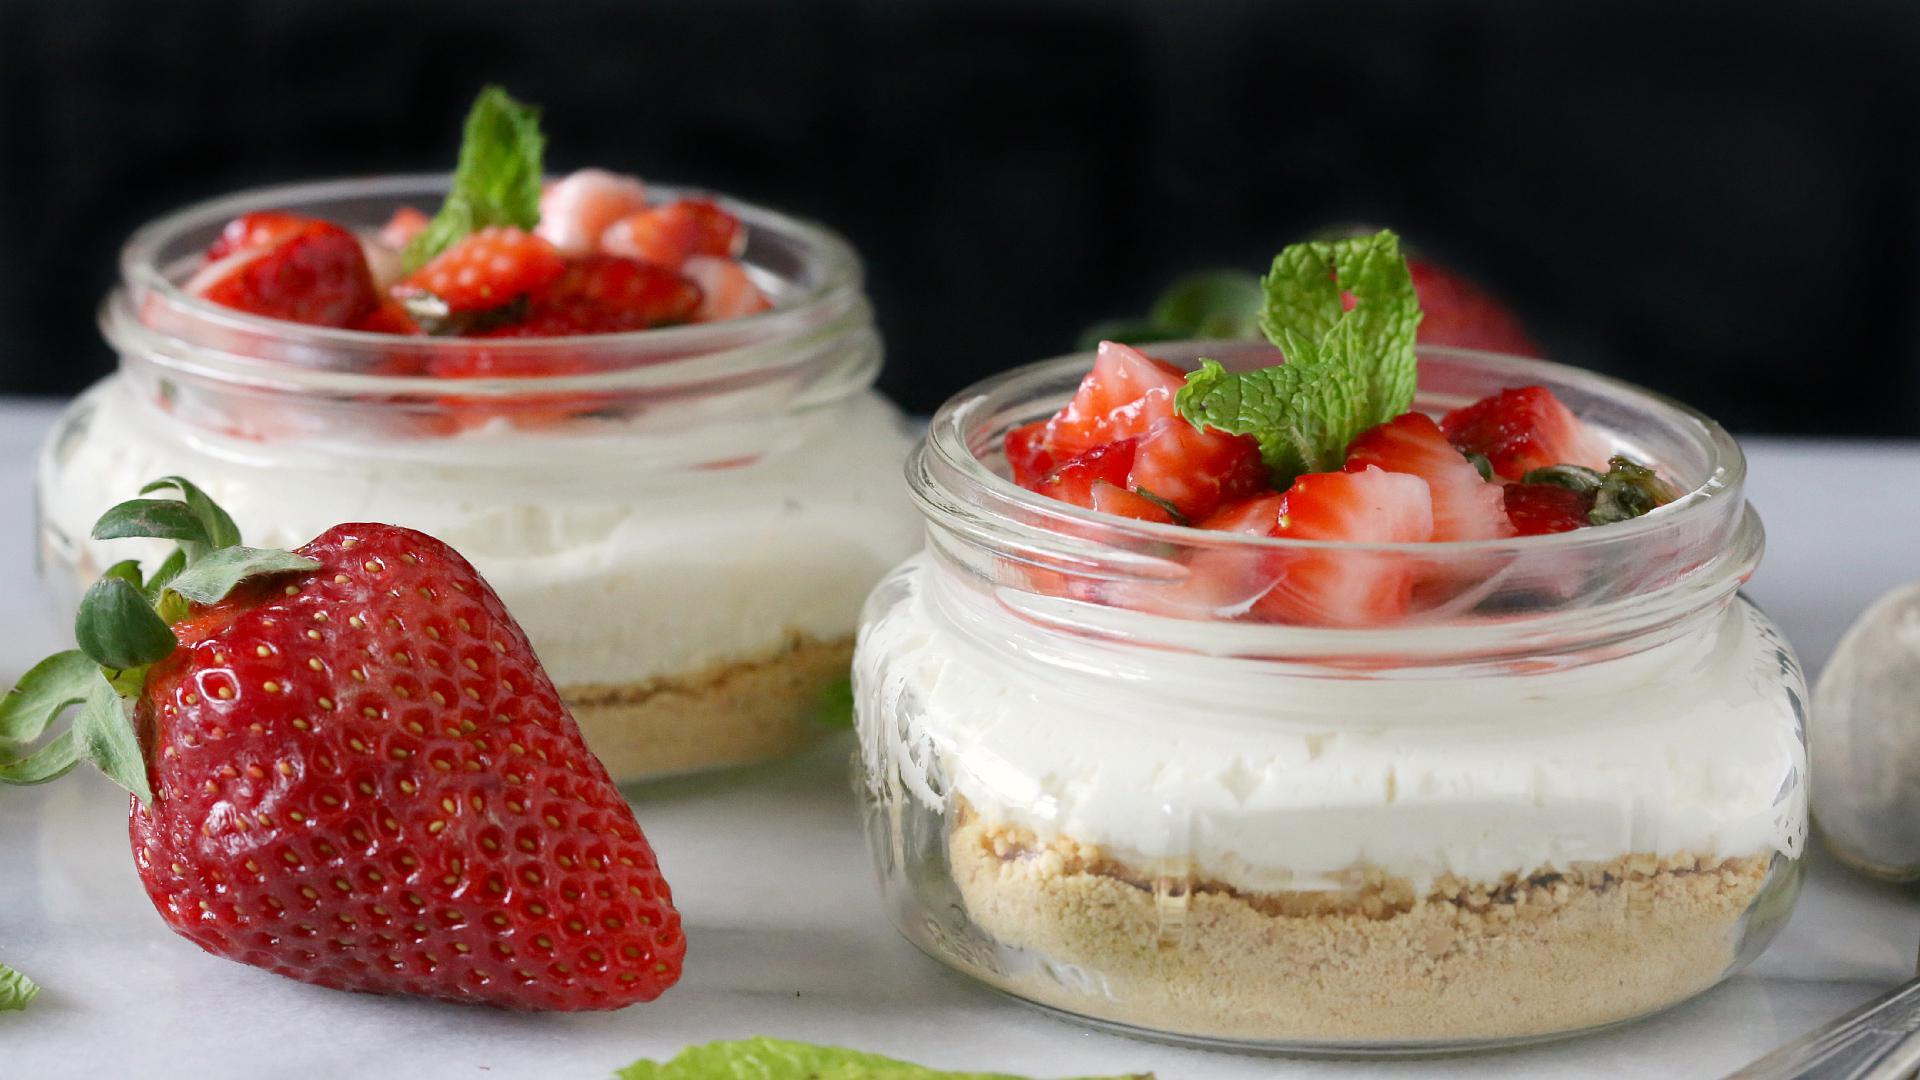 Light Airy No Bake Strawberry Mint Cheesecake Sheknows